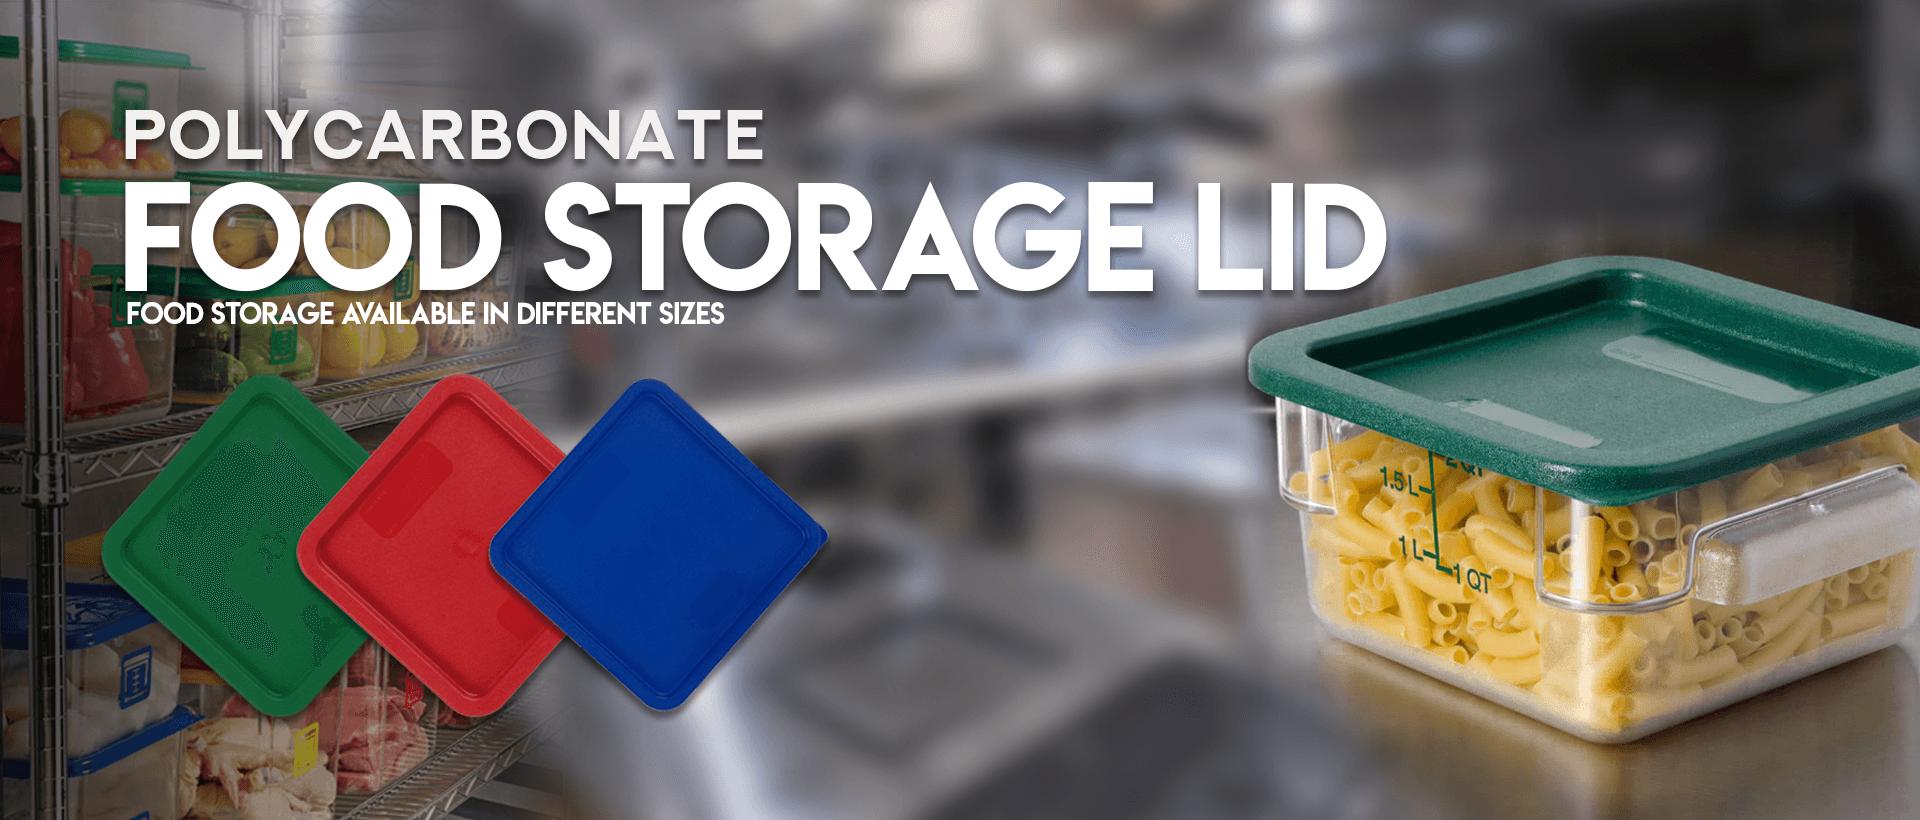 Food Storage Lid